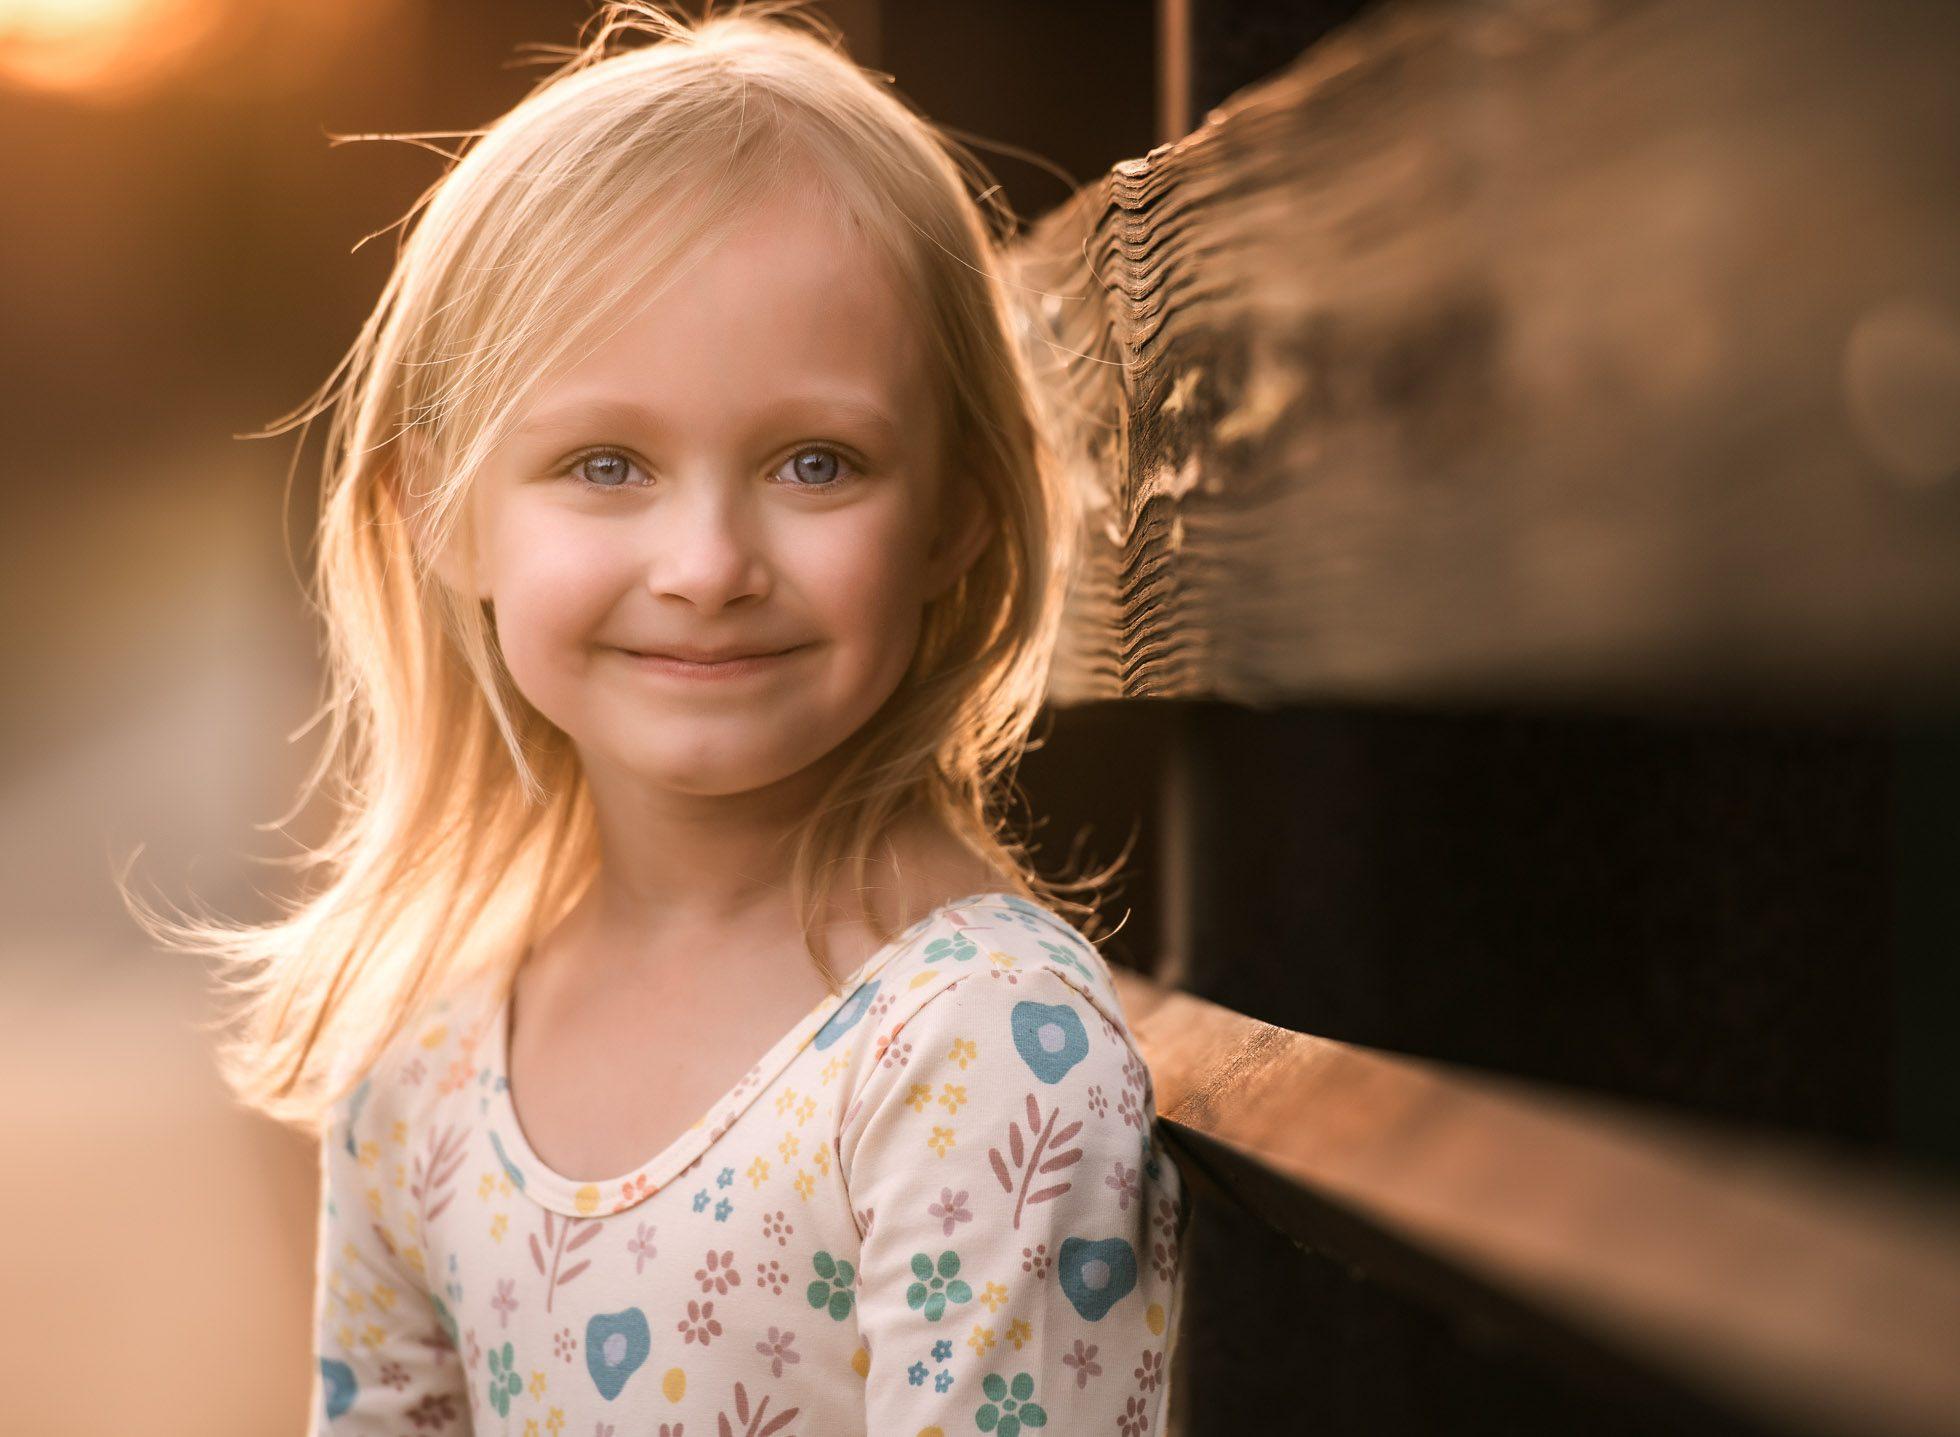 Young blonde girl on bridge in floral dress the sweetest smile girl on bridge edmond ok photographer oklahoma city natural light photographer kate luber photography